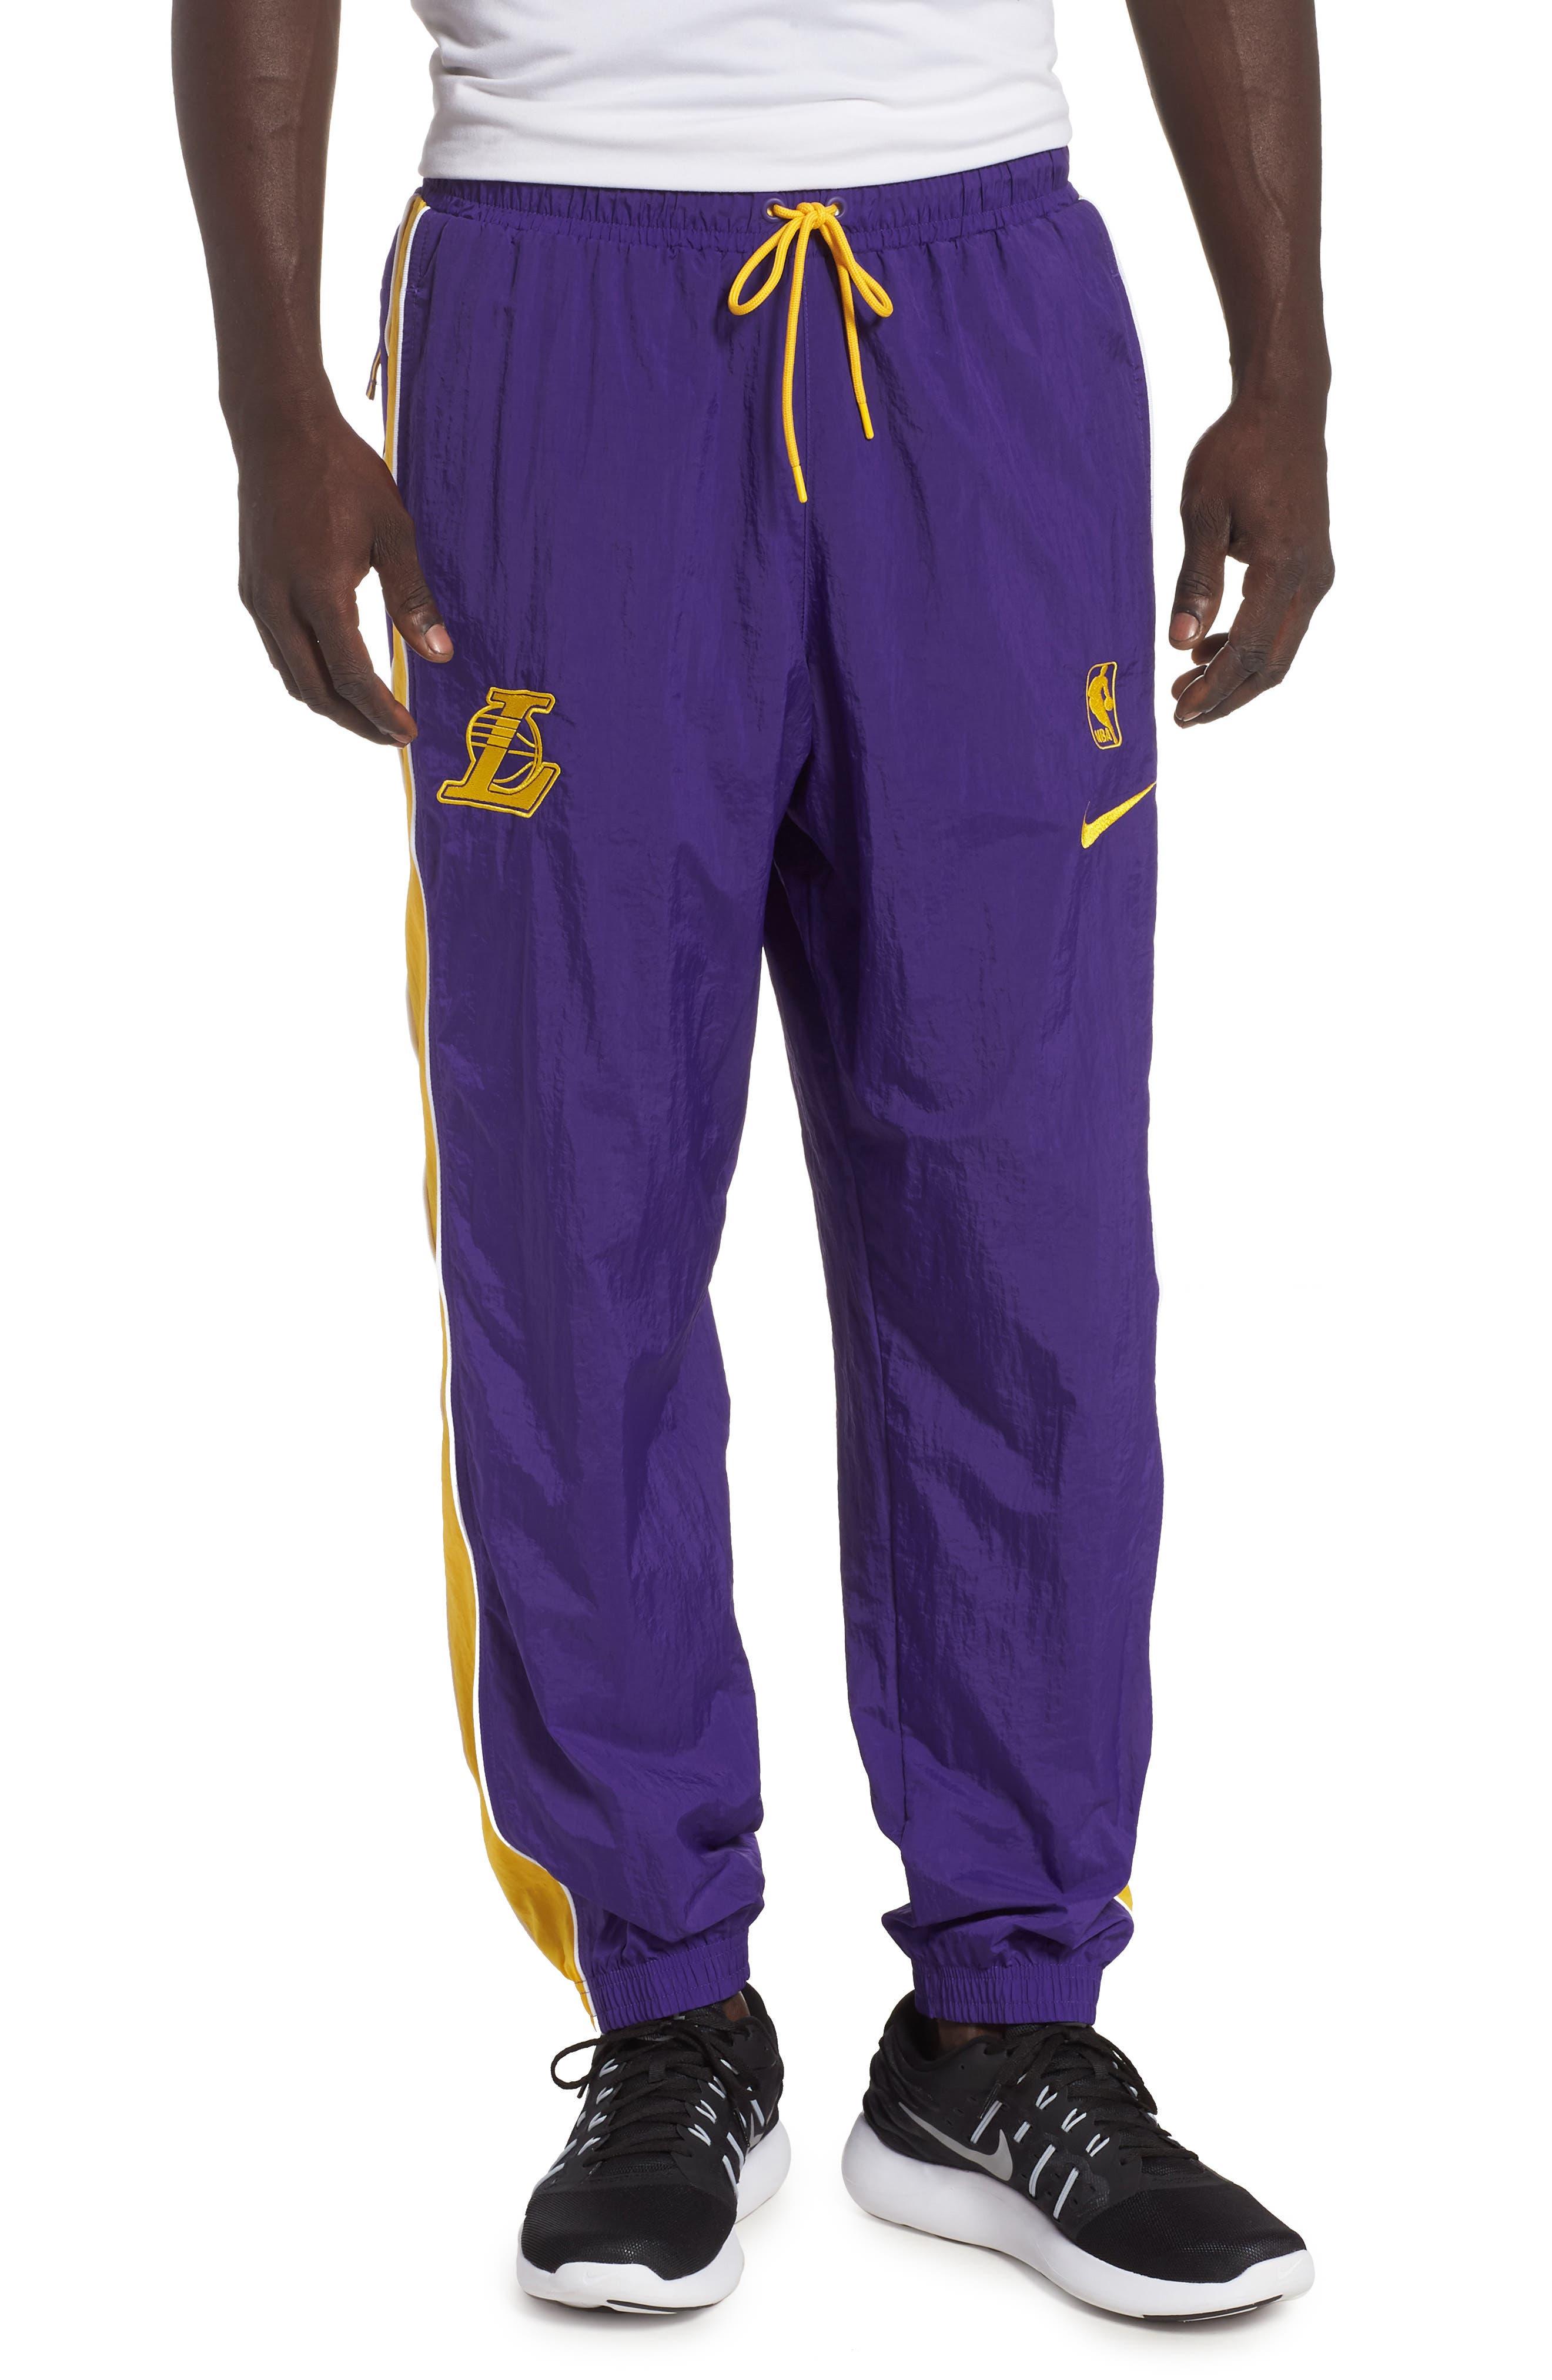 LA Lakers Tracksuit Pants,                             Main thumbnail 1, color,                             504